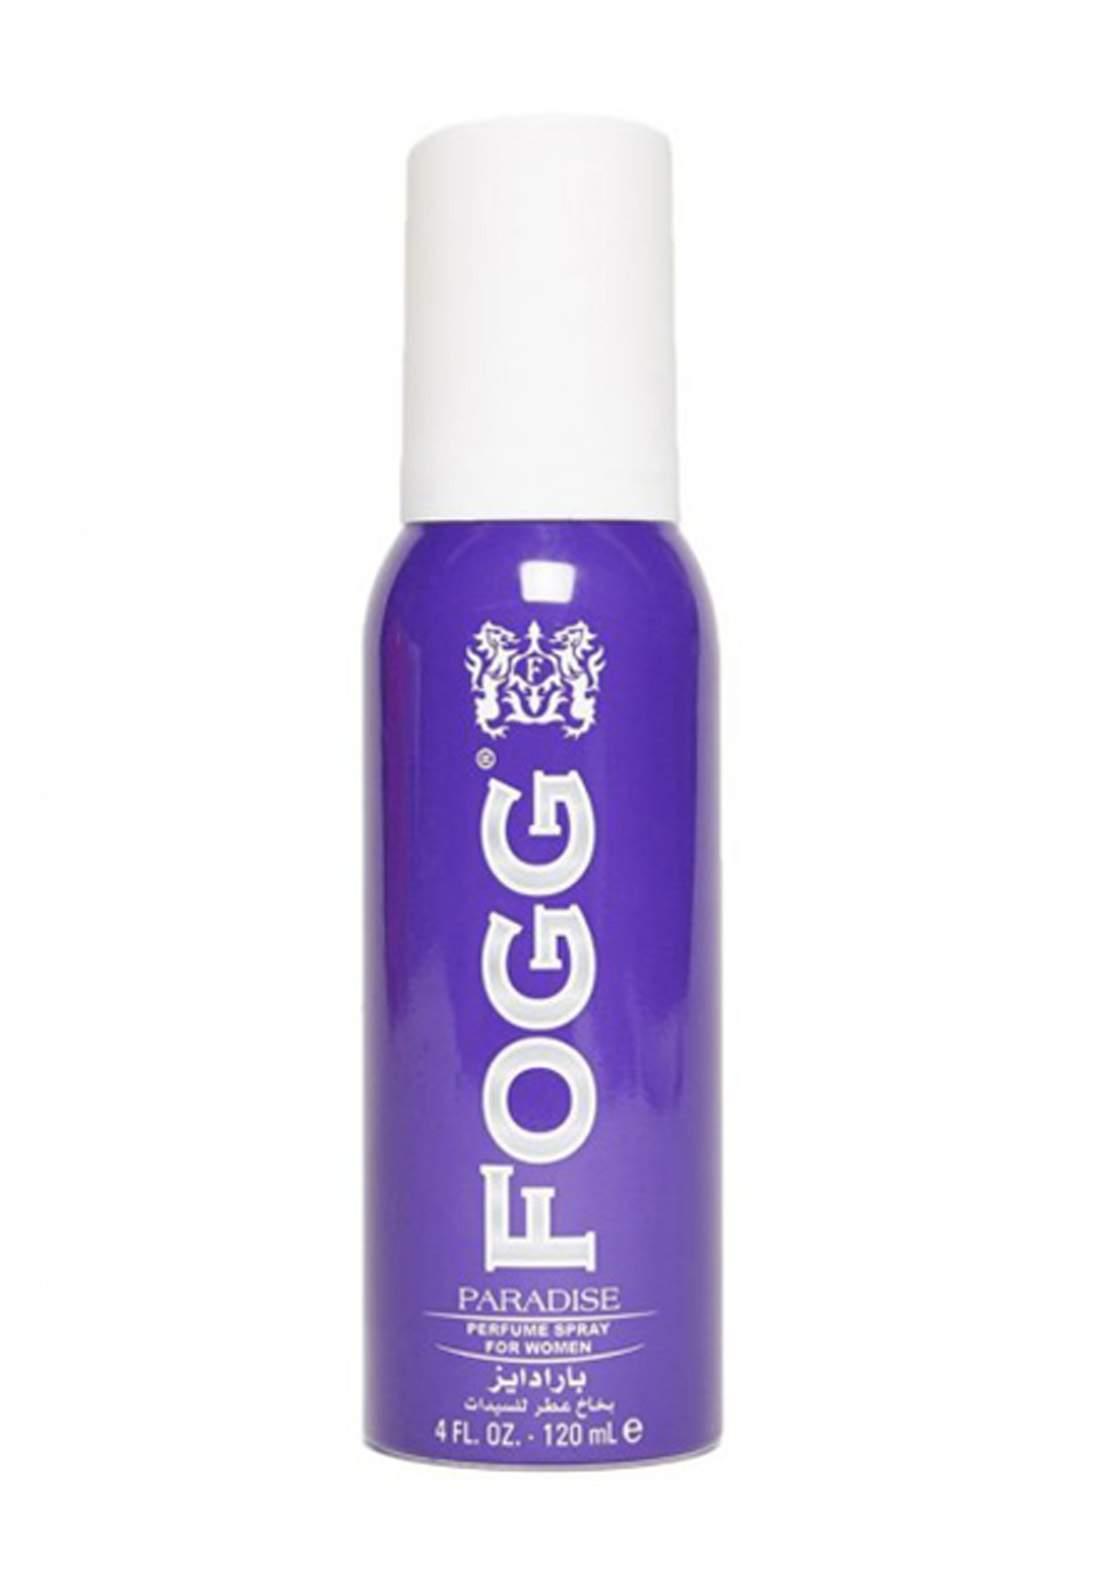 Fogg Paradise Fragrance Body Spray  For Women  120ml معطر جسم نسائي